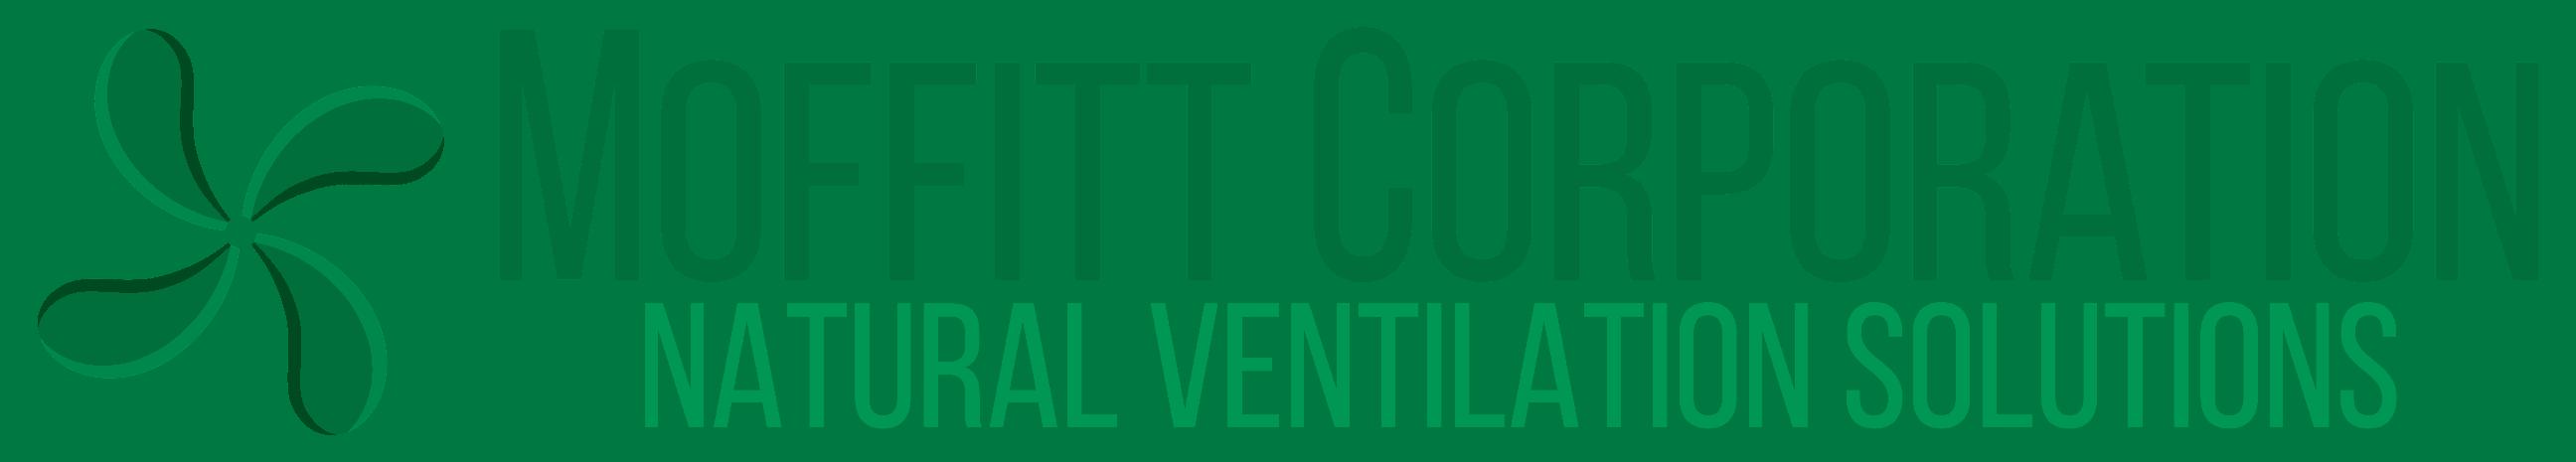 Moffitt Corporation Logo